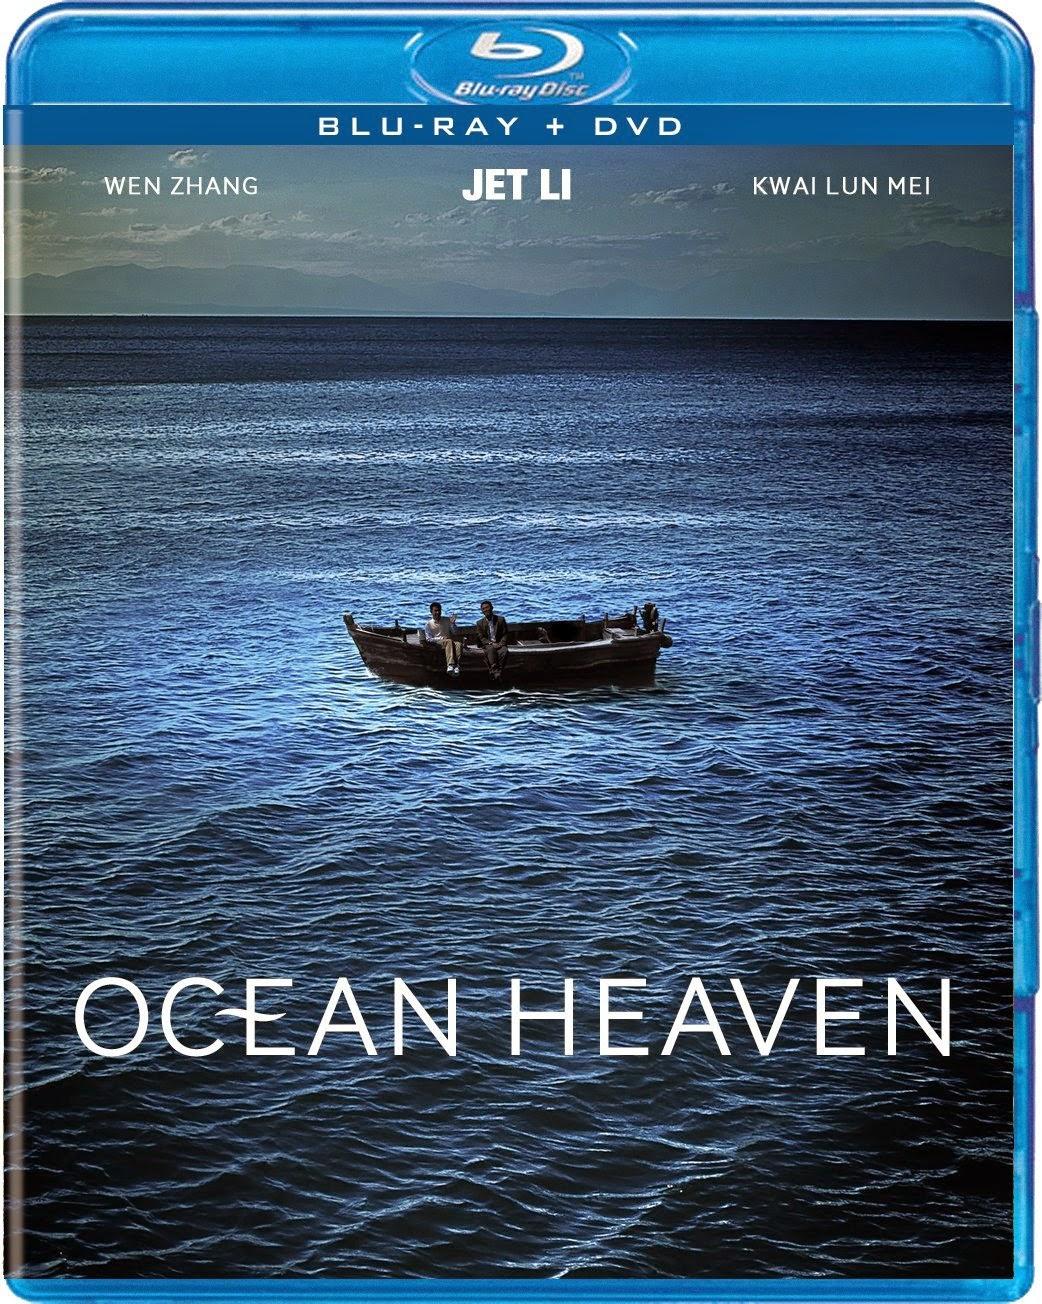 Ocean Heaven with Jet Li